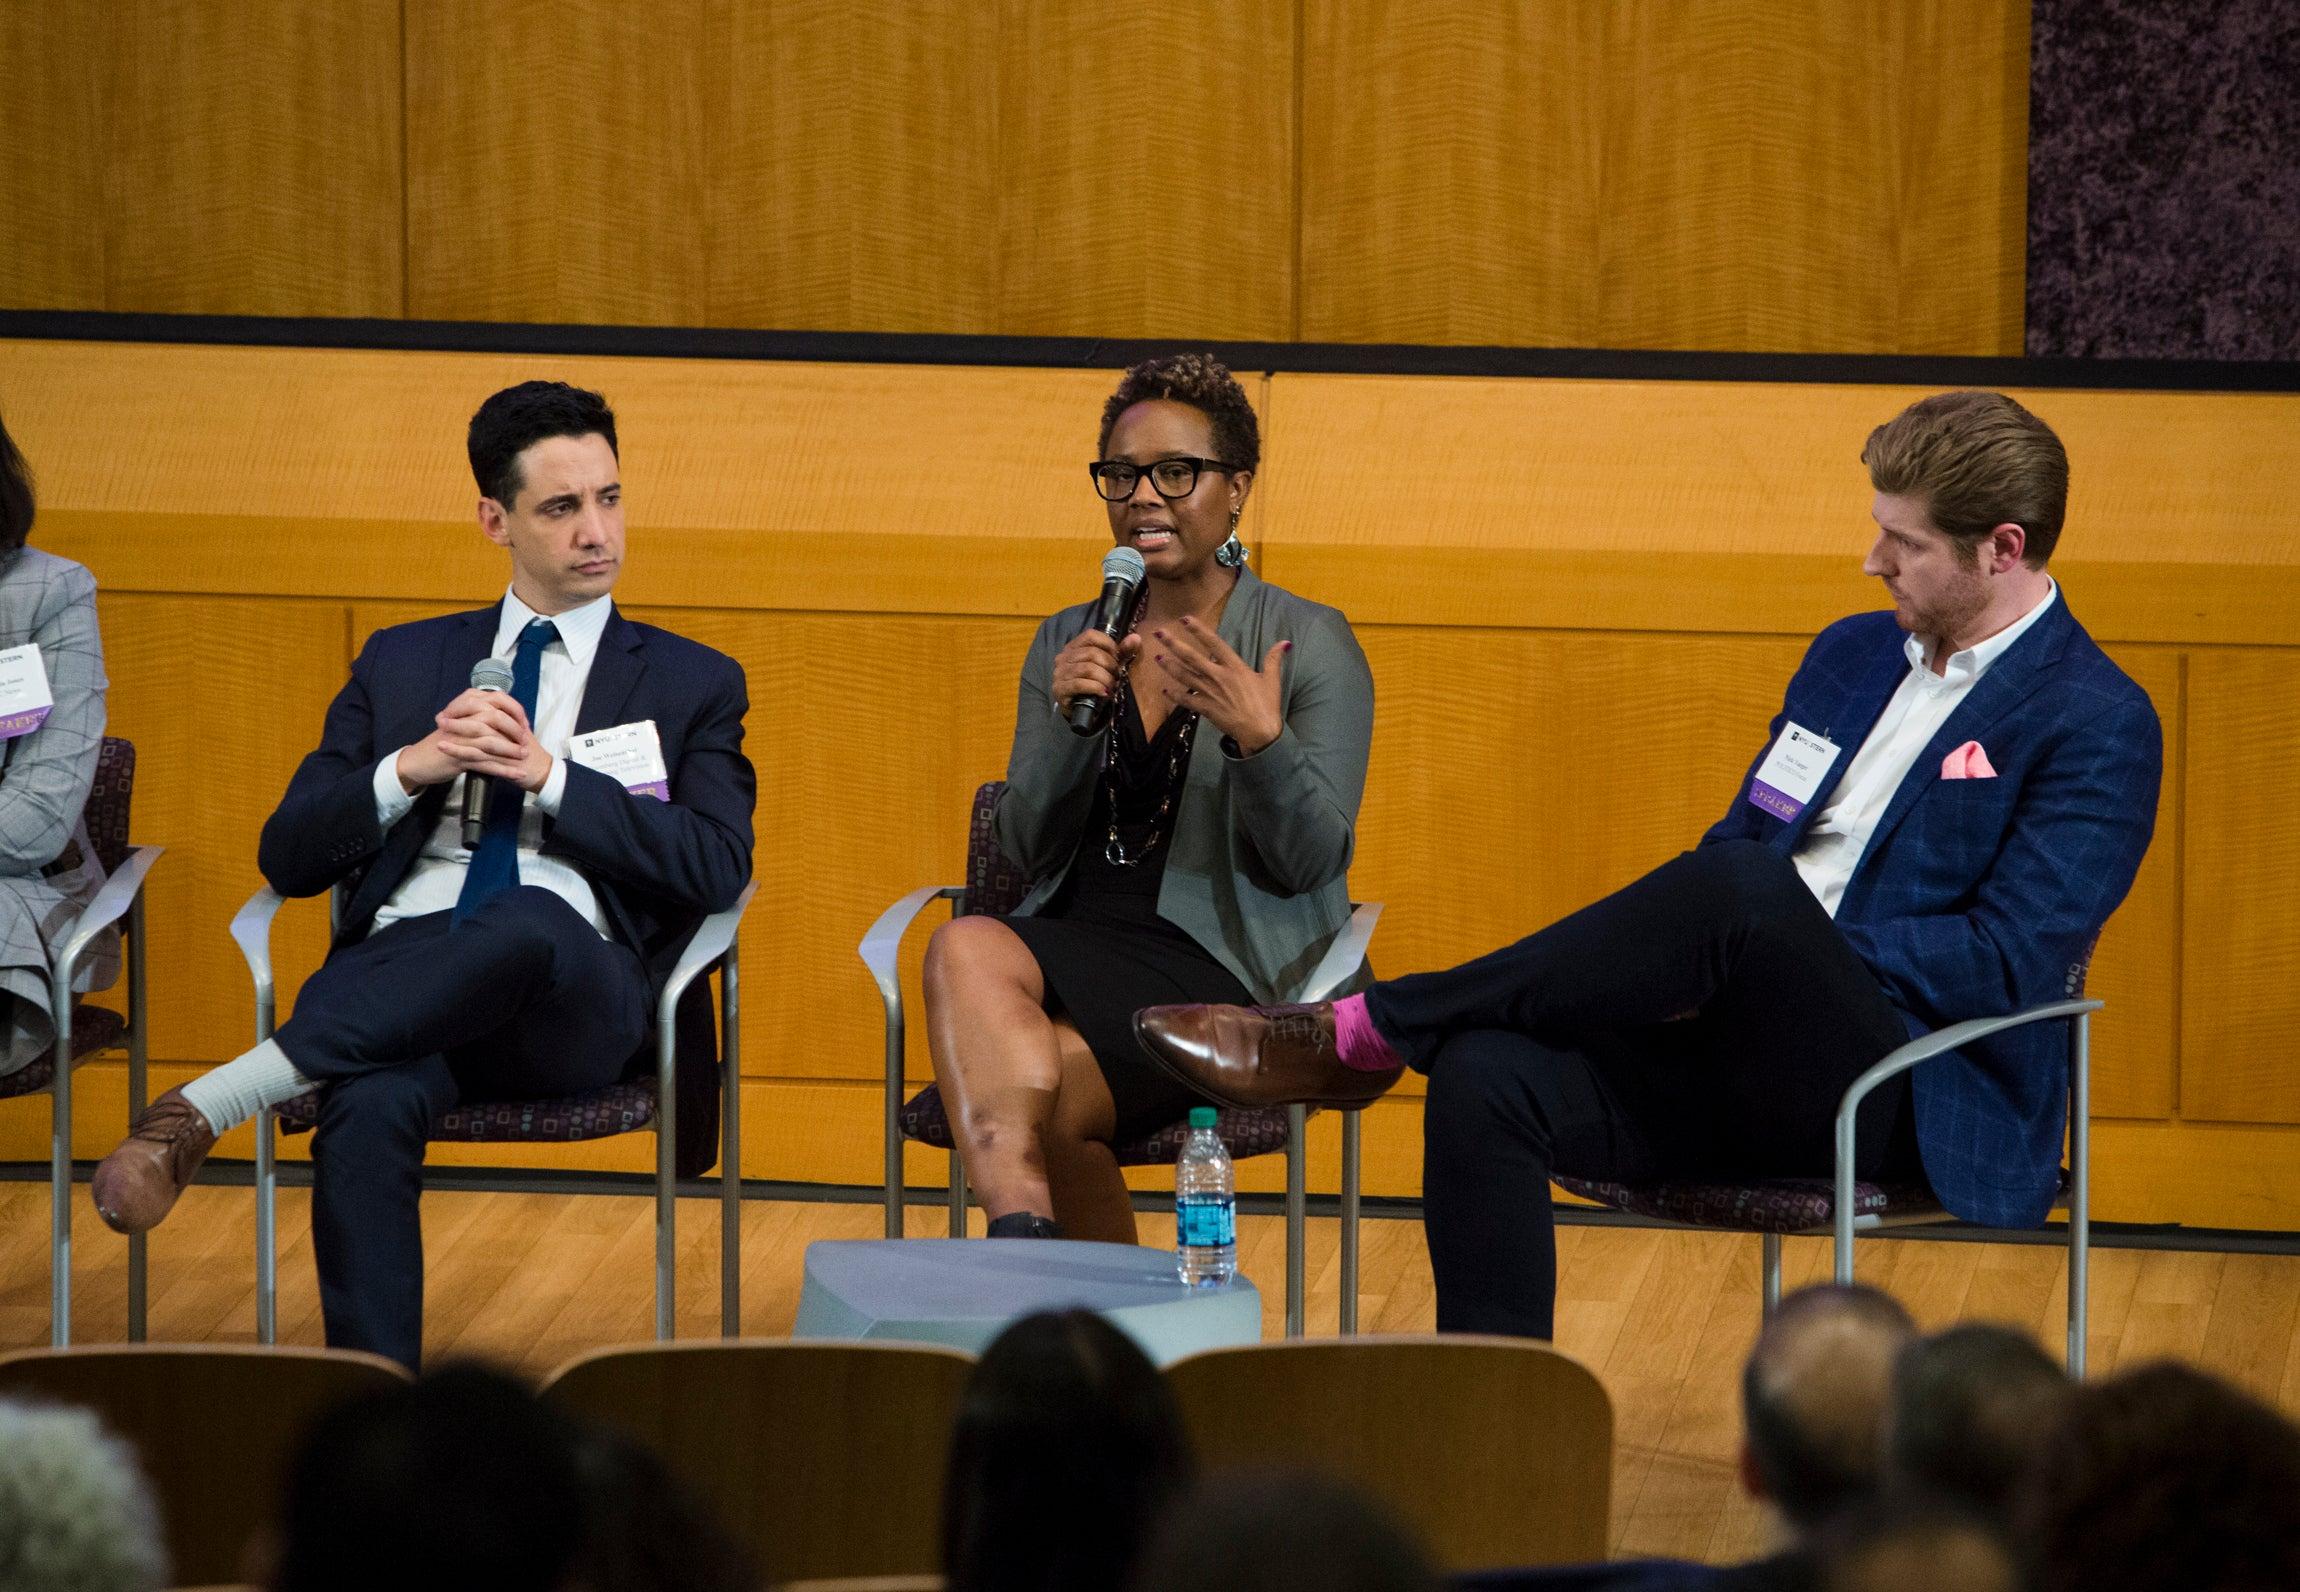 Panelists speak during the EMT Summit 2018